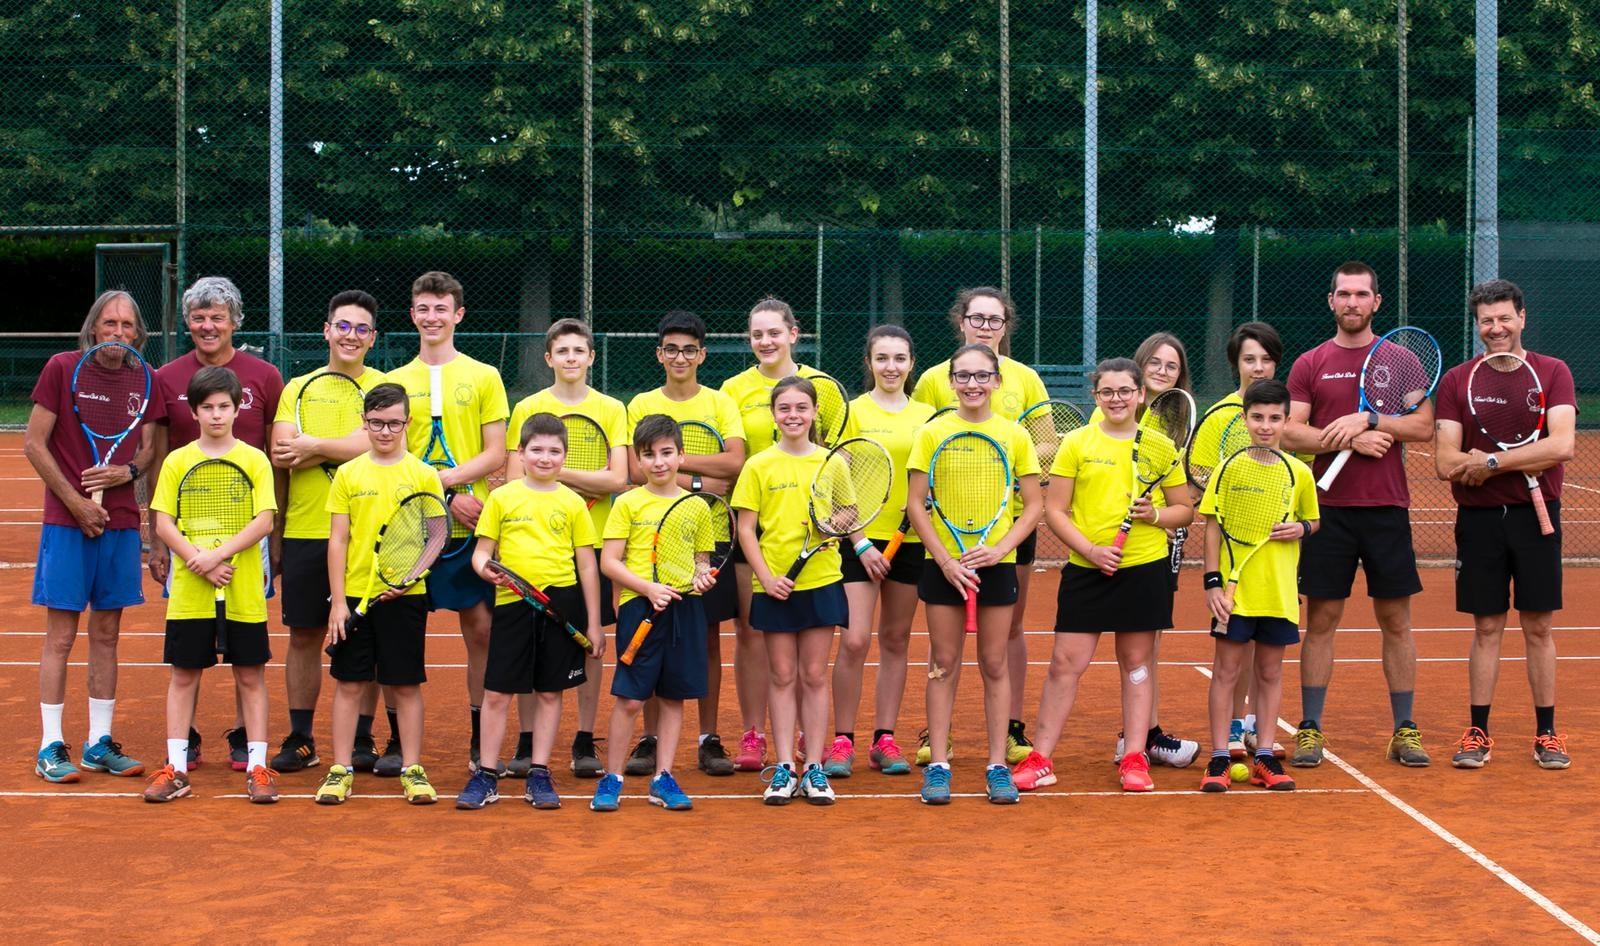 Scuola tennis certificata FIT